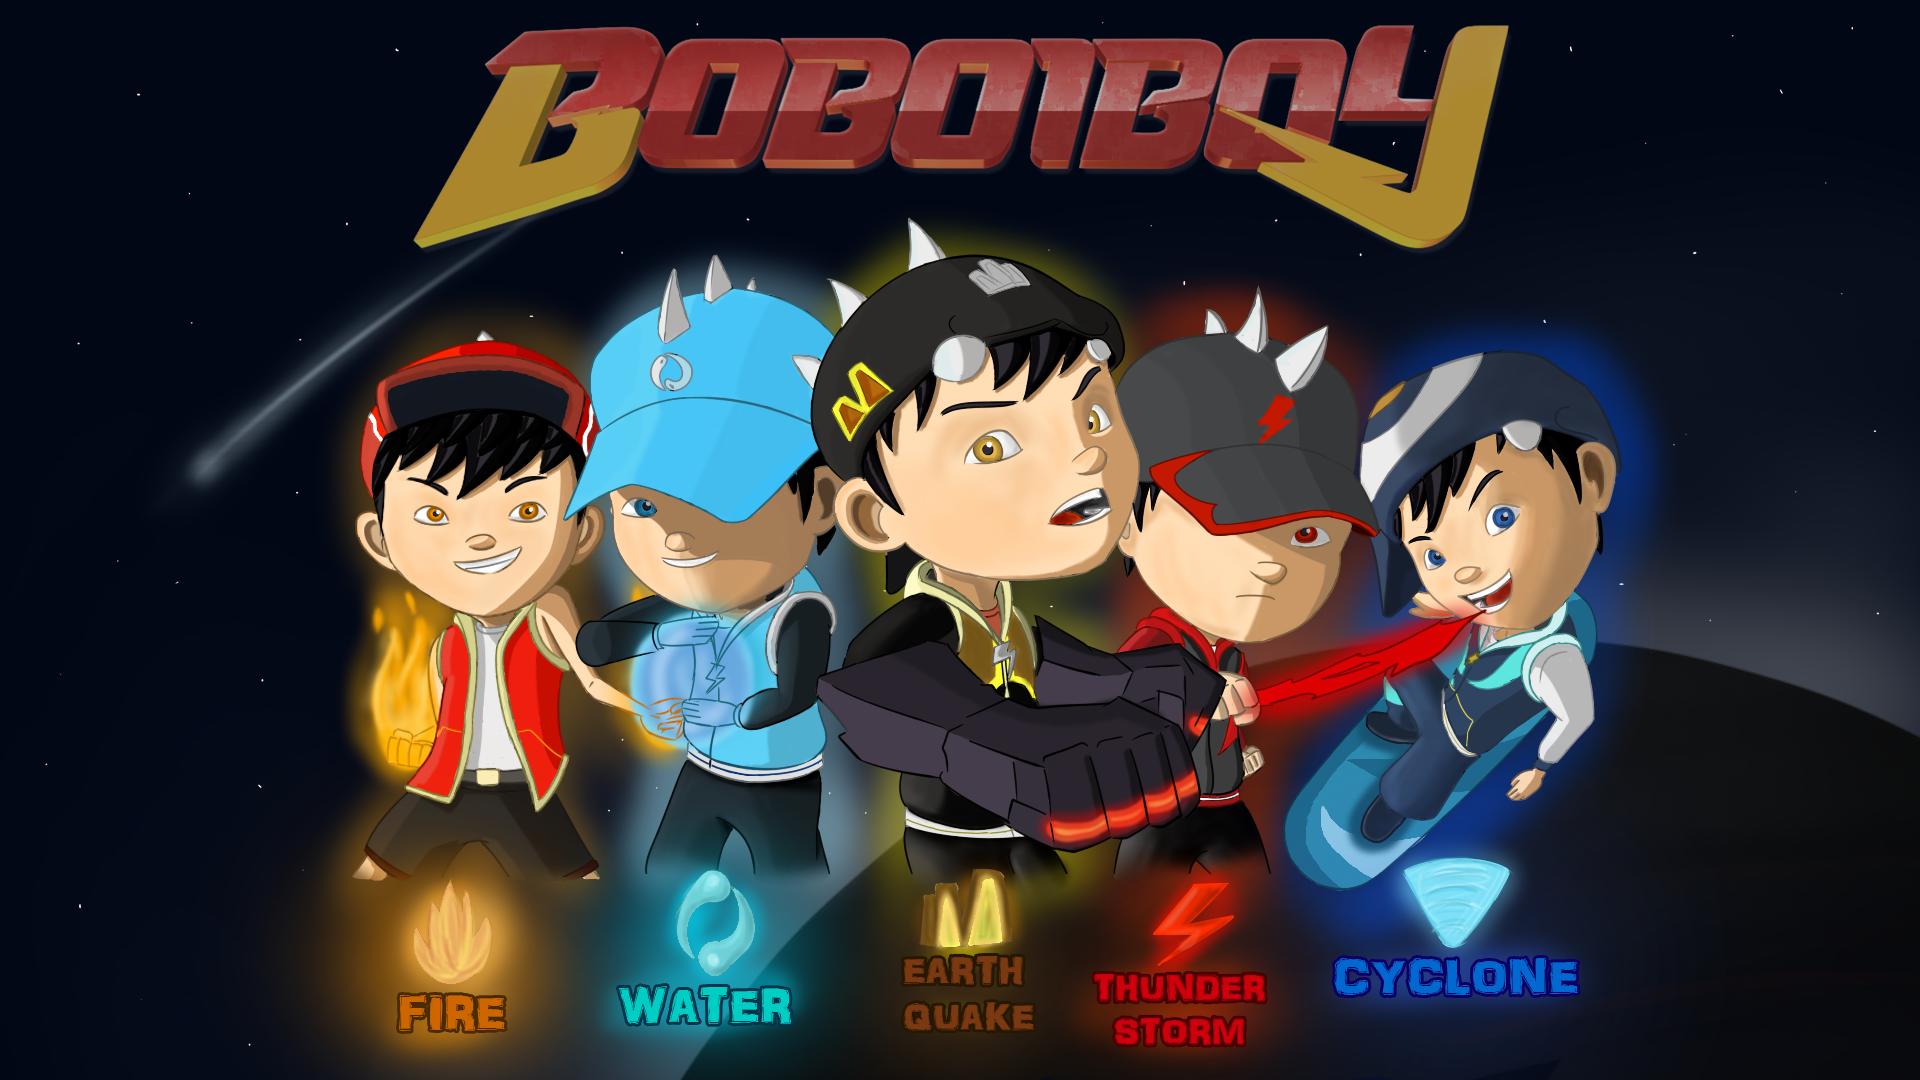 boboiboy galaxy fang kids super heroes